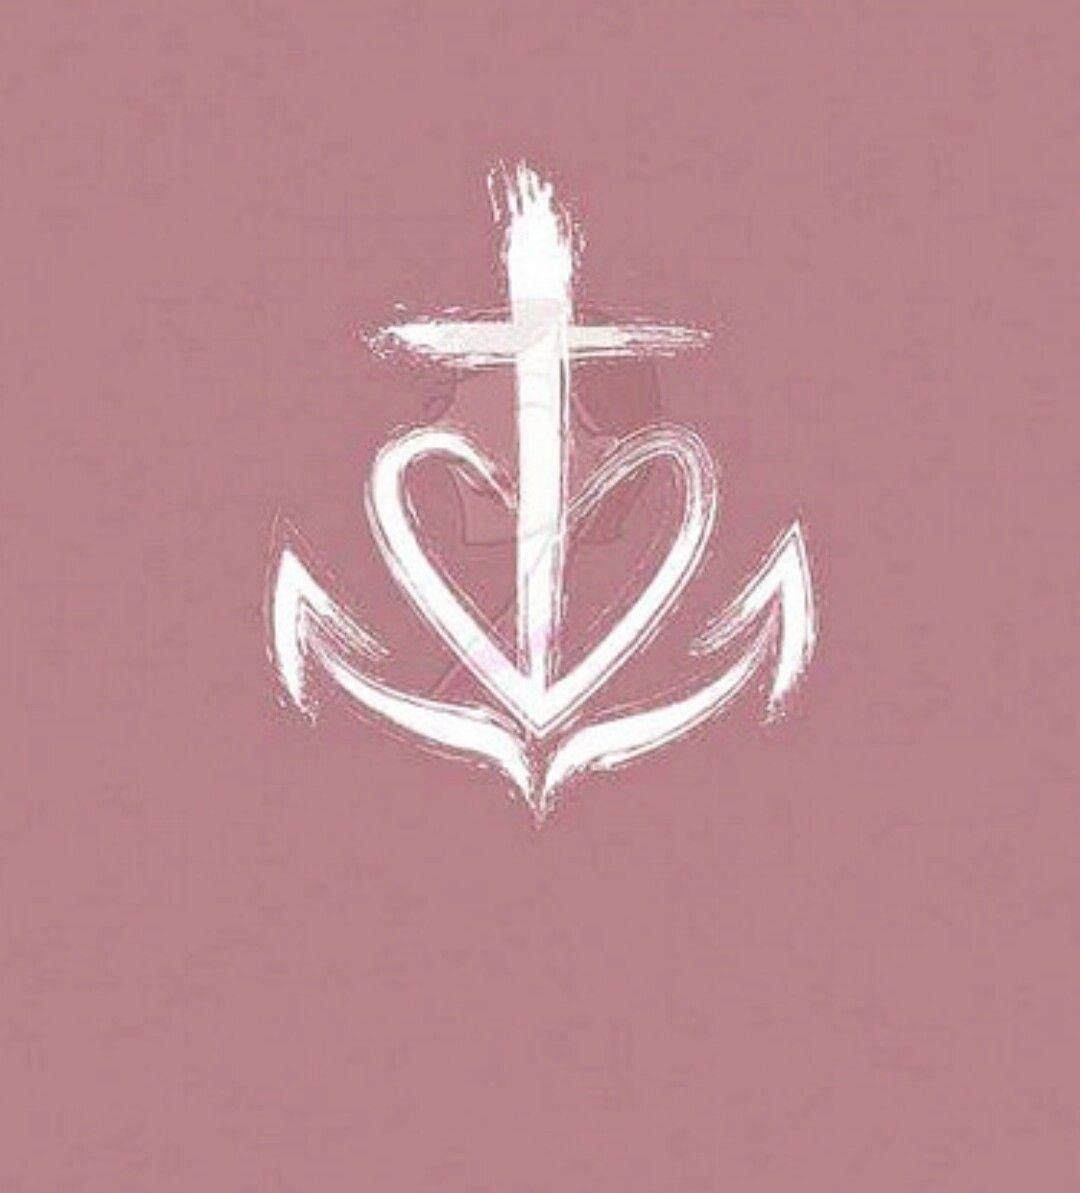 Pin by Sierha Beck on tattoo ideas | Pinterest | Tattoo, Tatting and ...